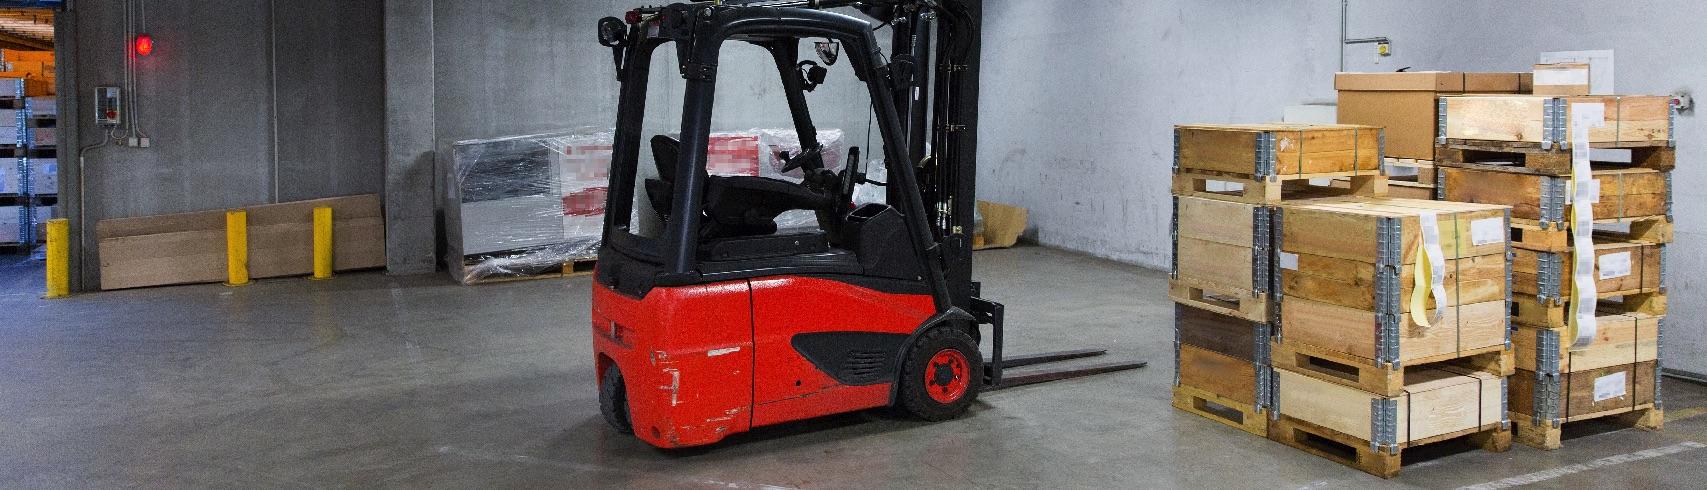 Forklift Rental Austin, TX - Tobly Equipment Rental